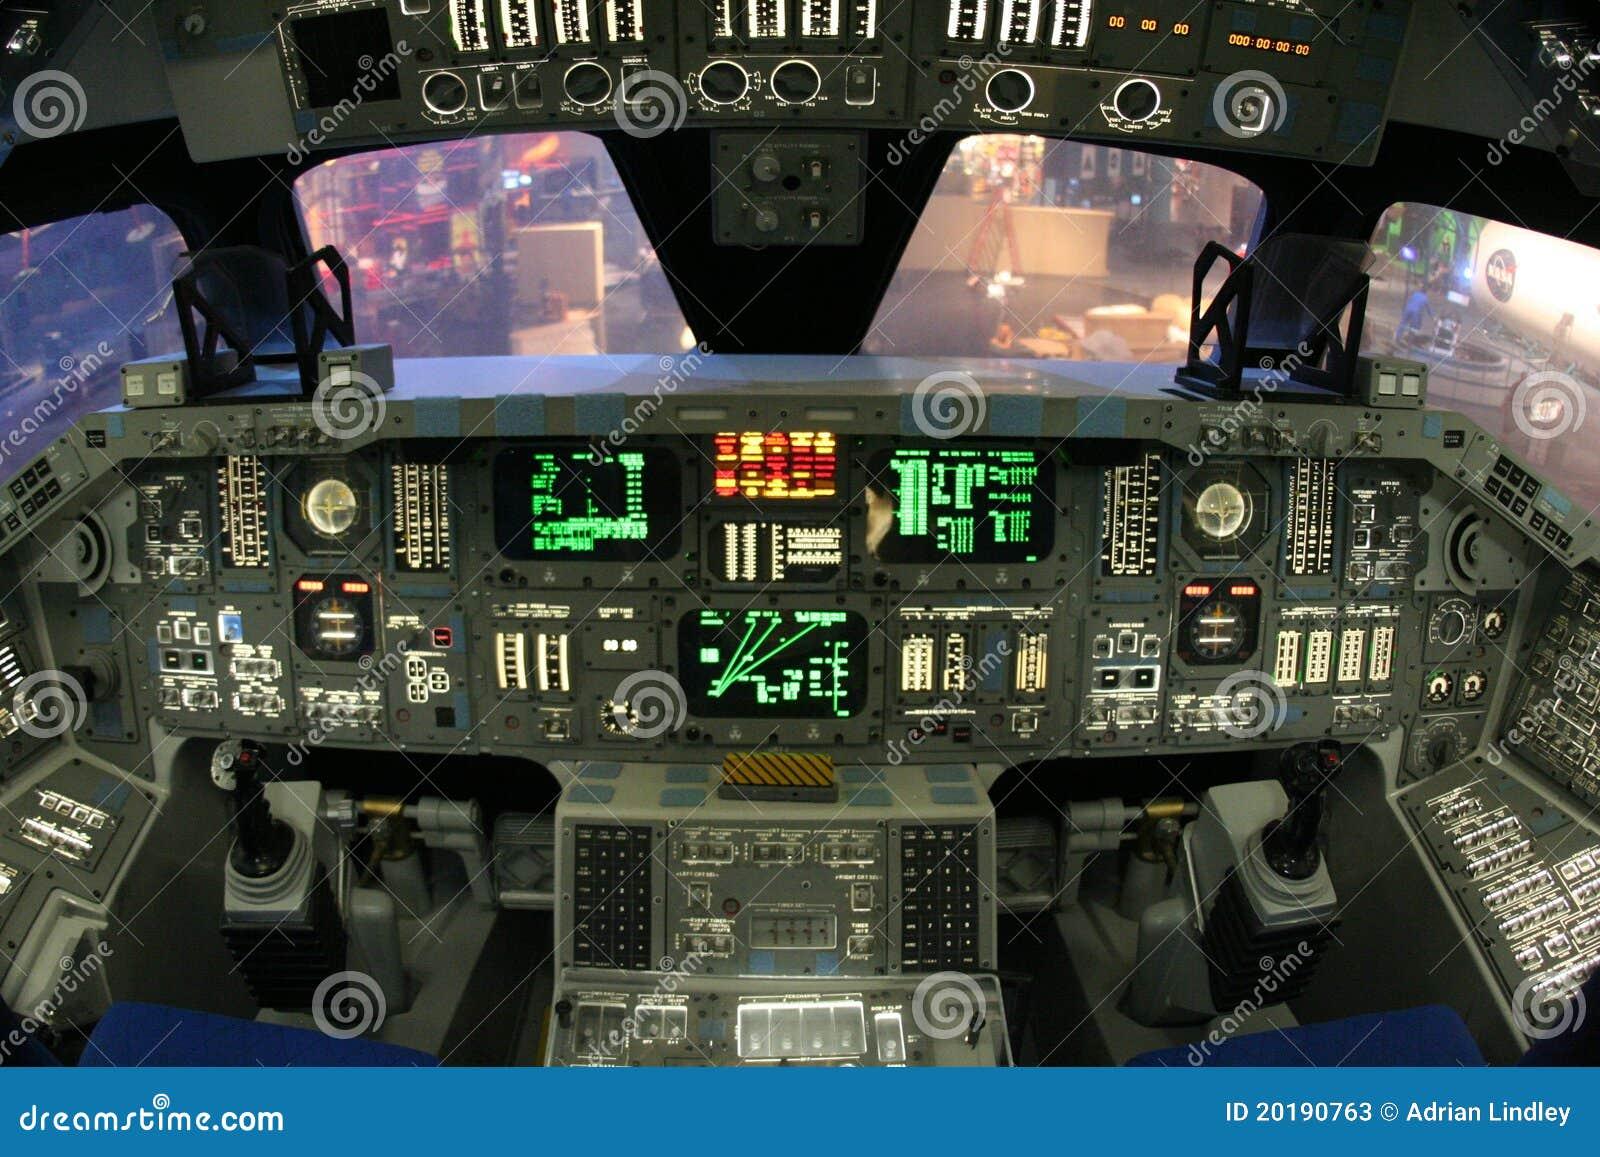 NASA Space Shuttle Cockpit Editorial Stock Photo - Image: 20190763